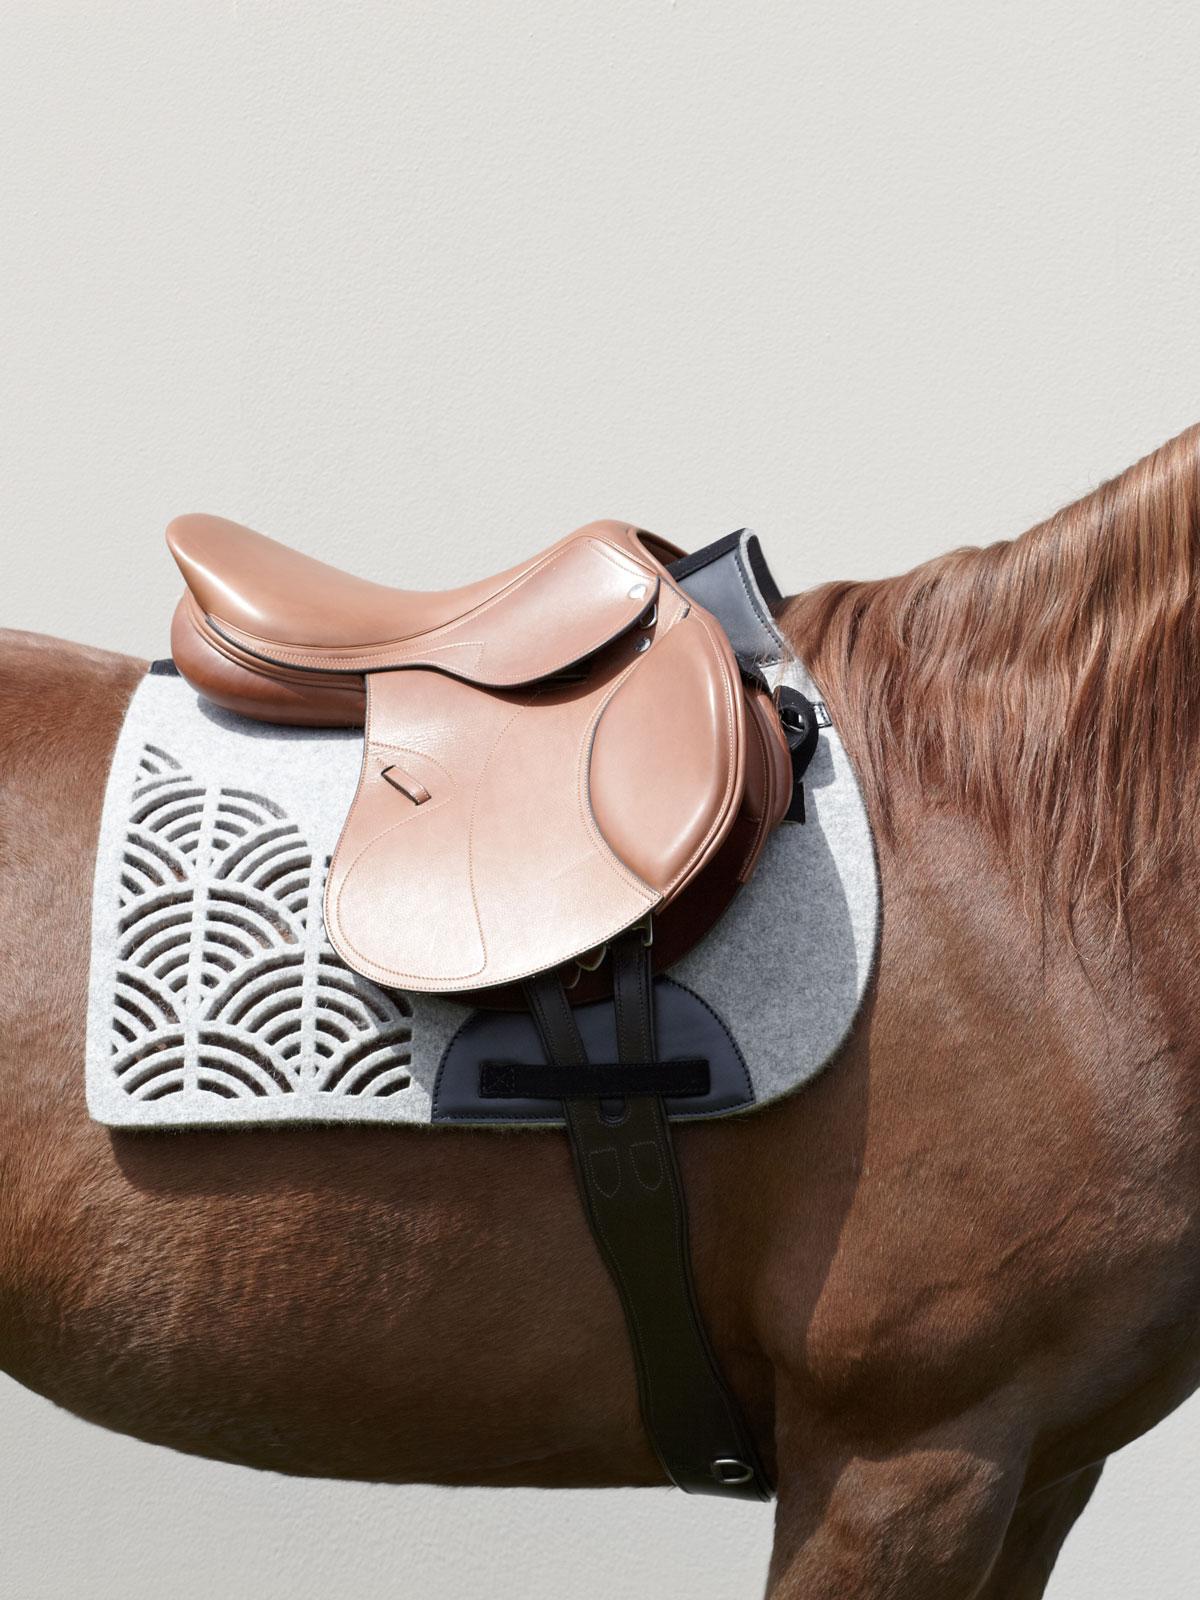 VALOR pure wool felt saddle pad STERZING